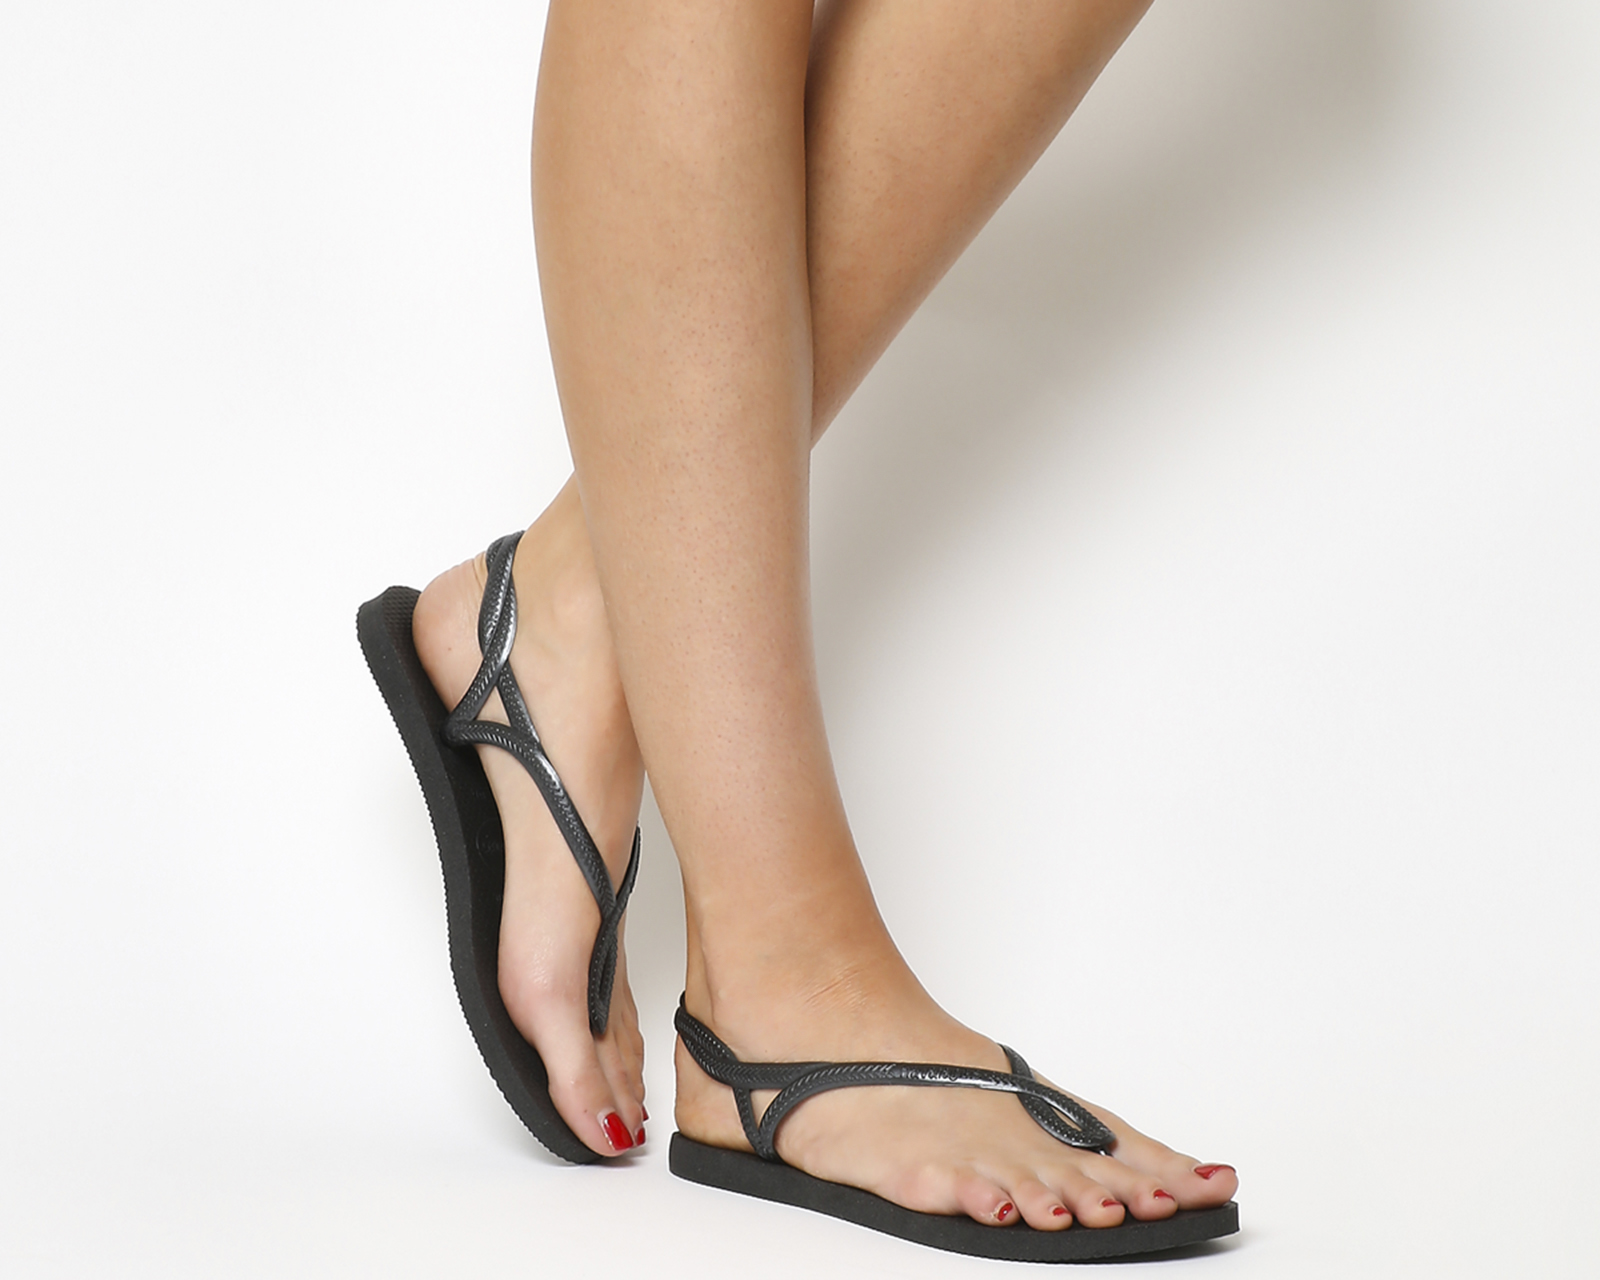 00630c5b144 Sentinel Womens Havaianas Luna Flip Flops Black Sandals